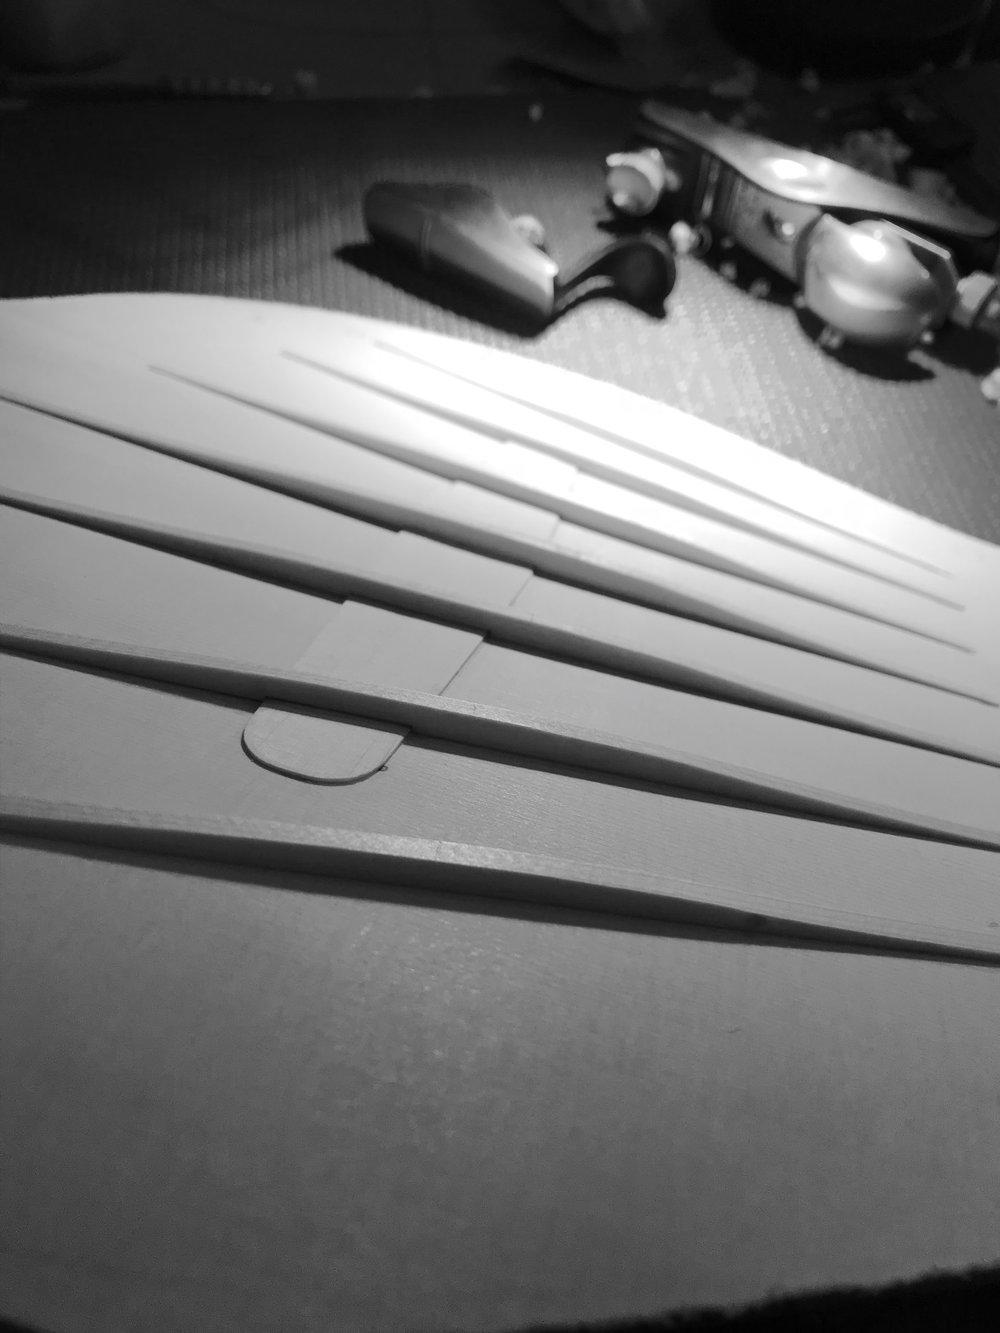 parra_guitars_soundboard_bracing.jpeg